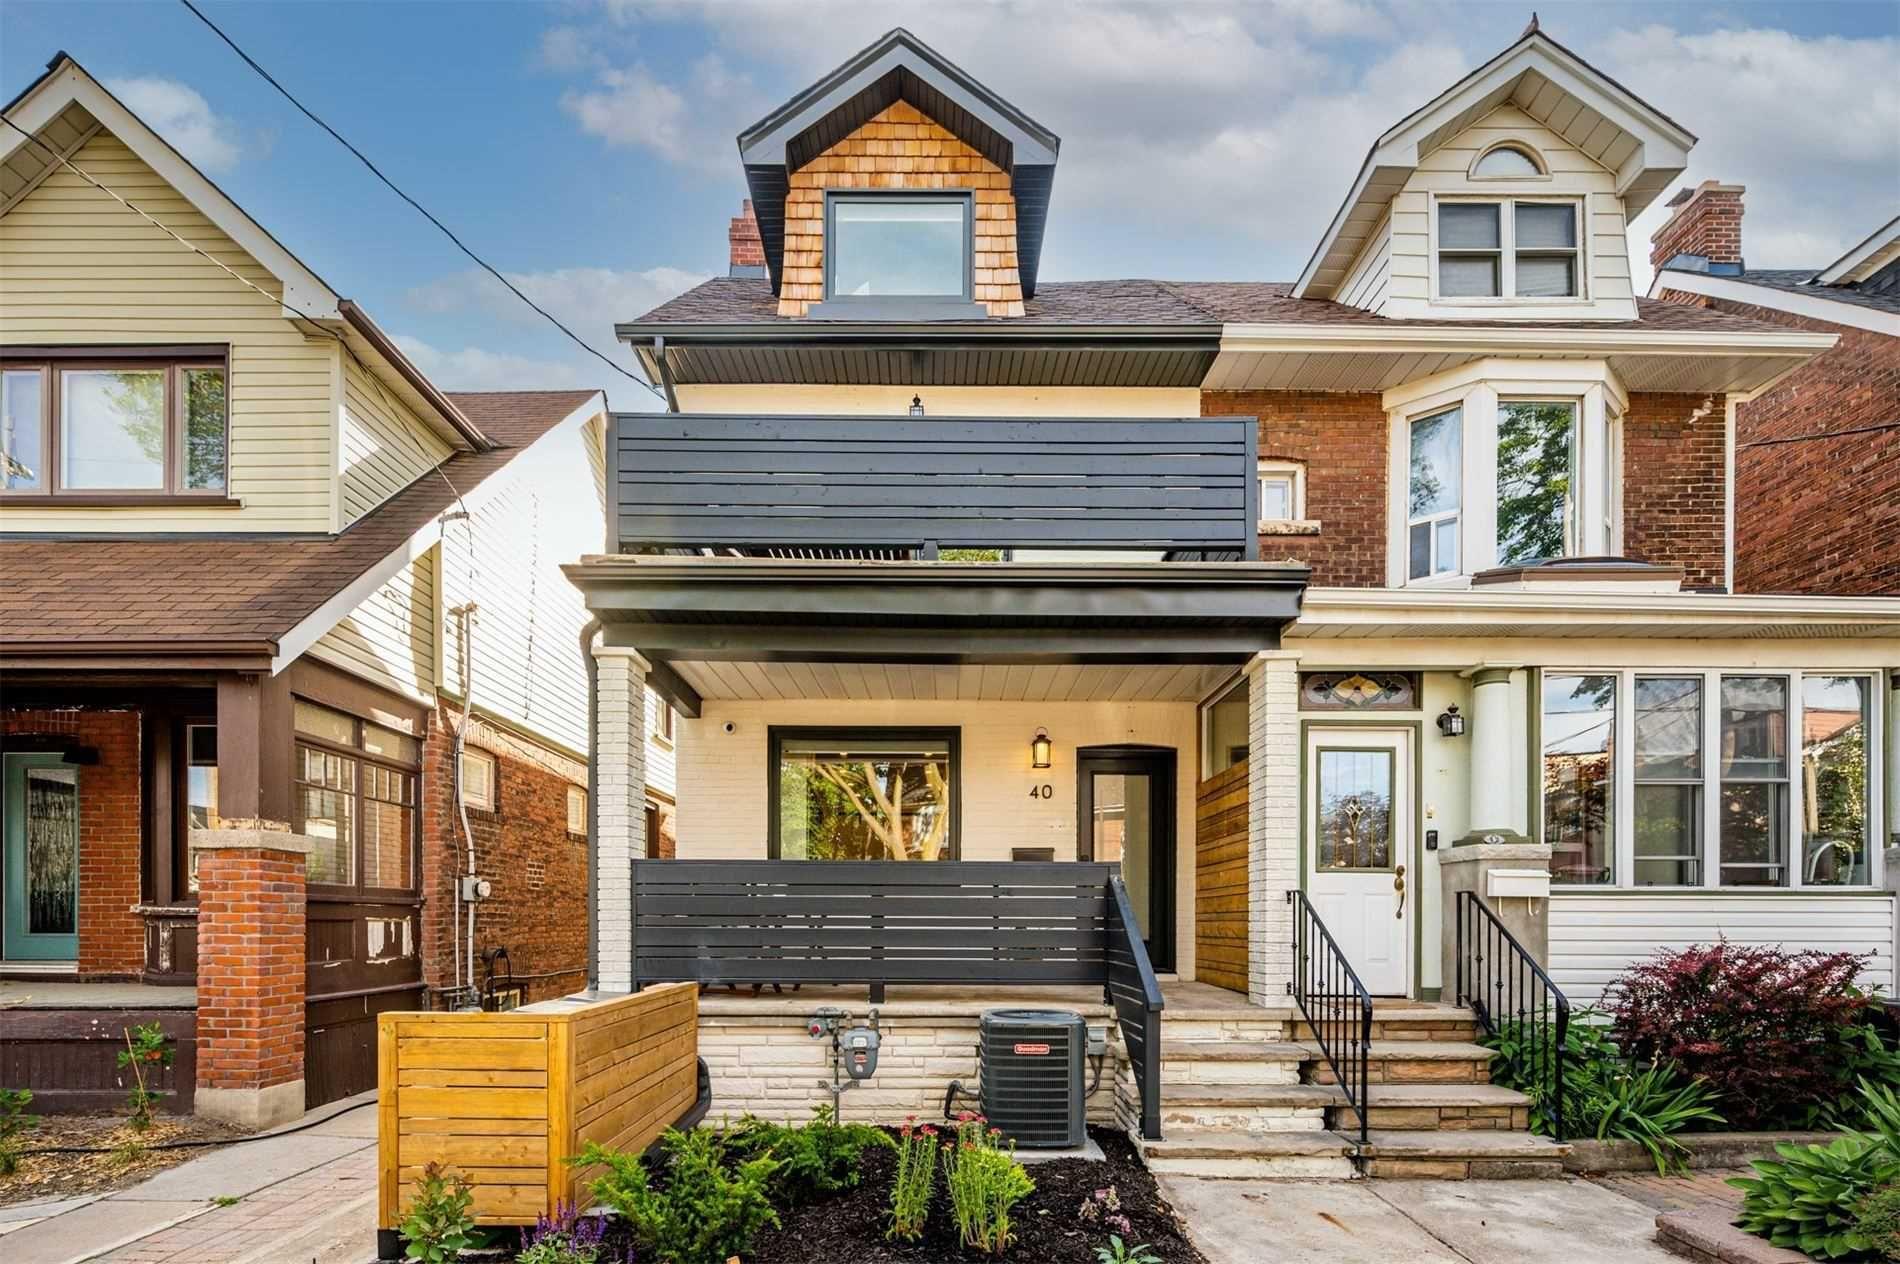 Main Photo: A 40 Dewhurst Boulevard in Toronto: Danforth House (2 1/2 Storey) for lease (Toronto E03)  : MLS®# E5279765